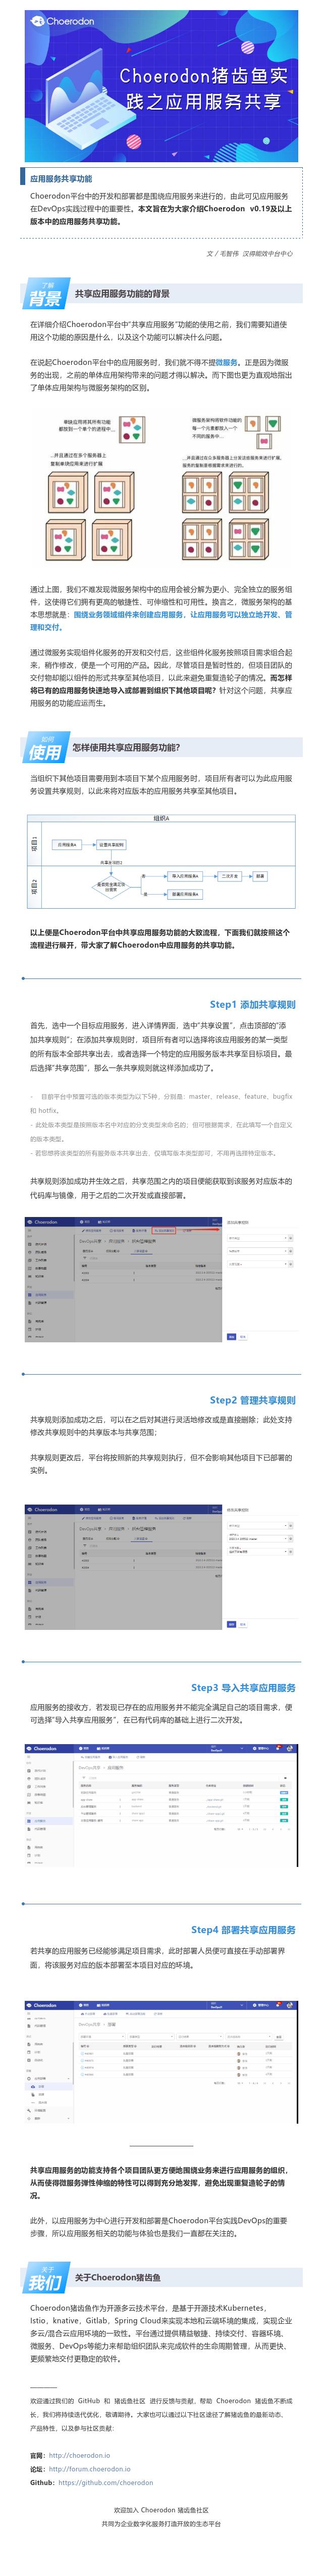 Choerodon猪齿鱼理论之使用效劳共享 -钱柜QG777_开源棋牌.png